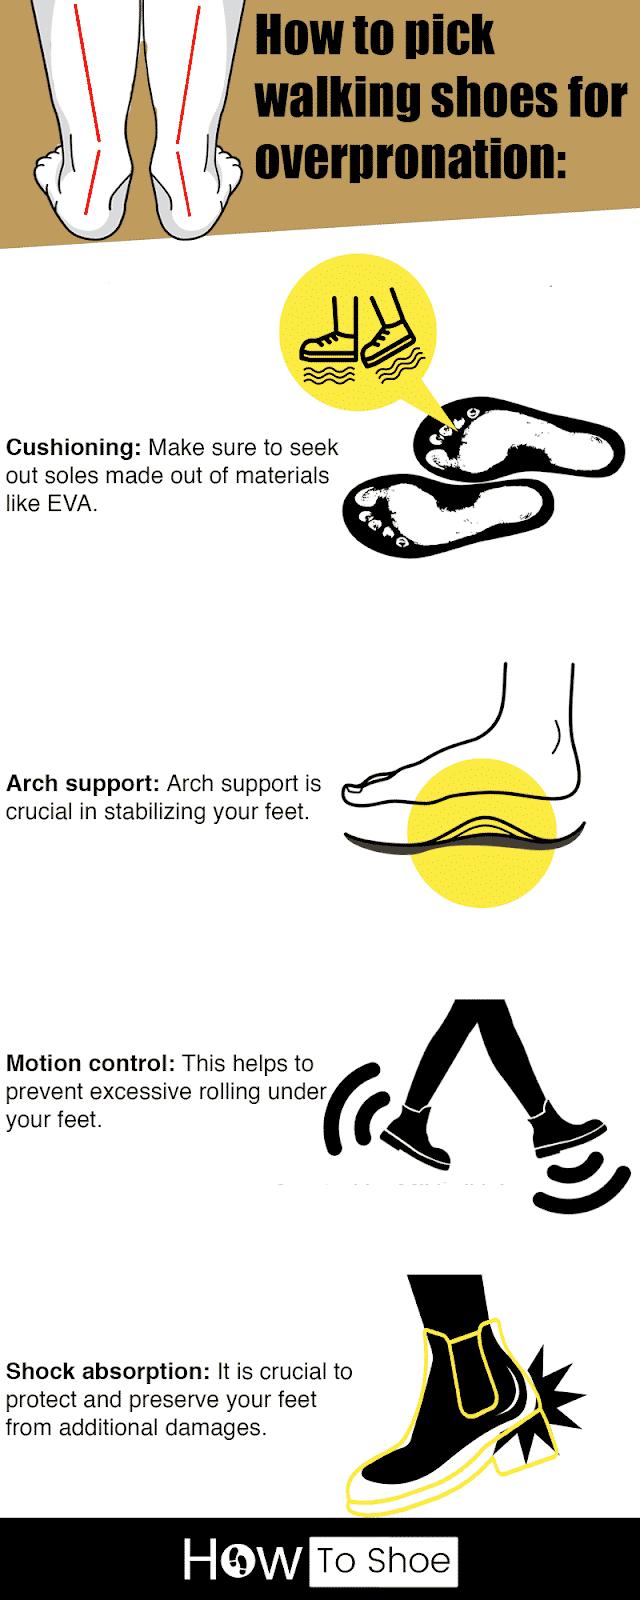 Walking Shoes for Overpronation